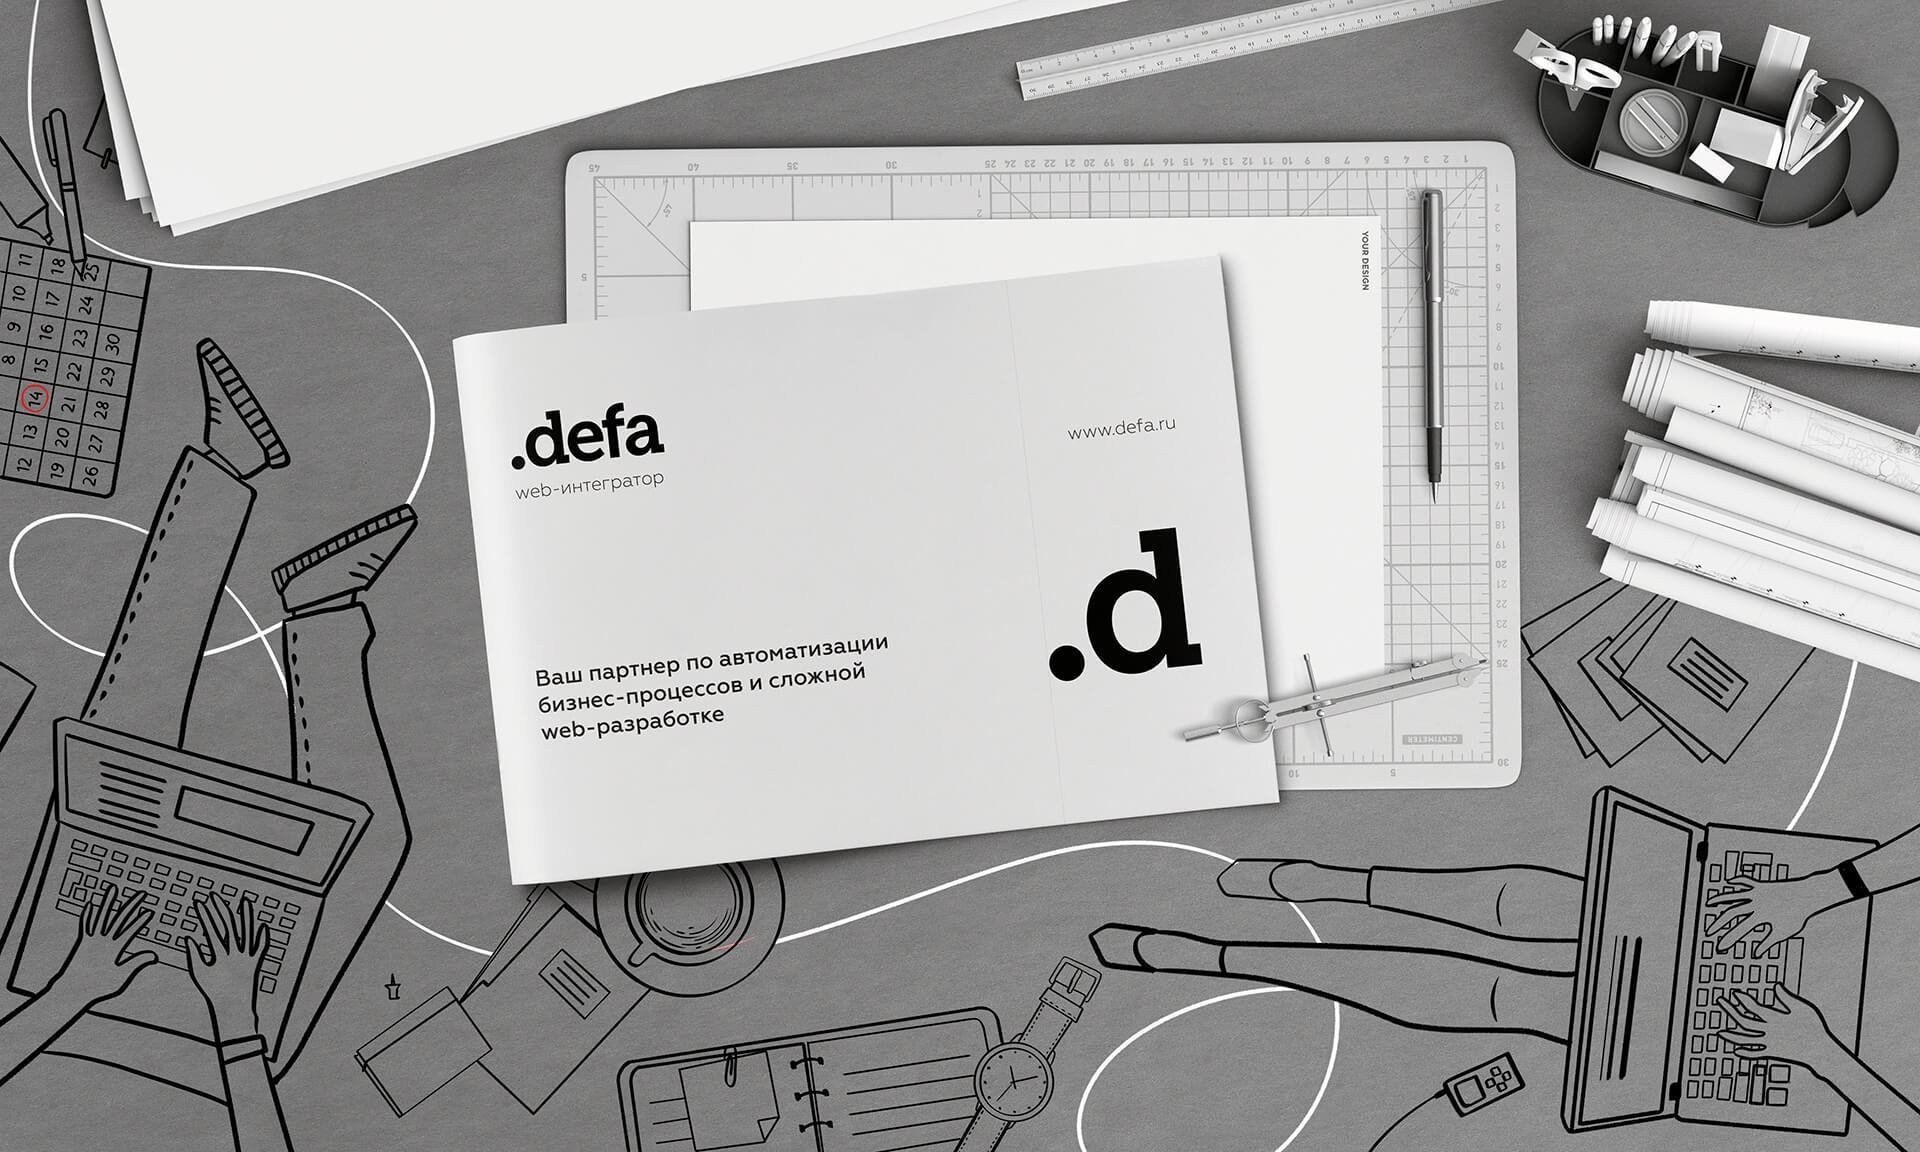 Презентация рекламного агентства под заказ в Москве